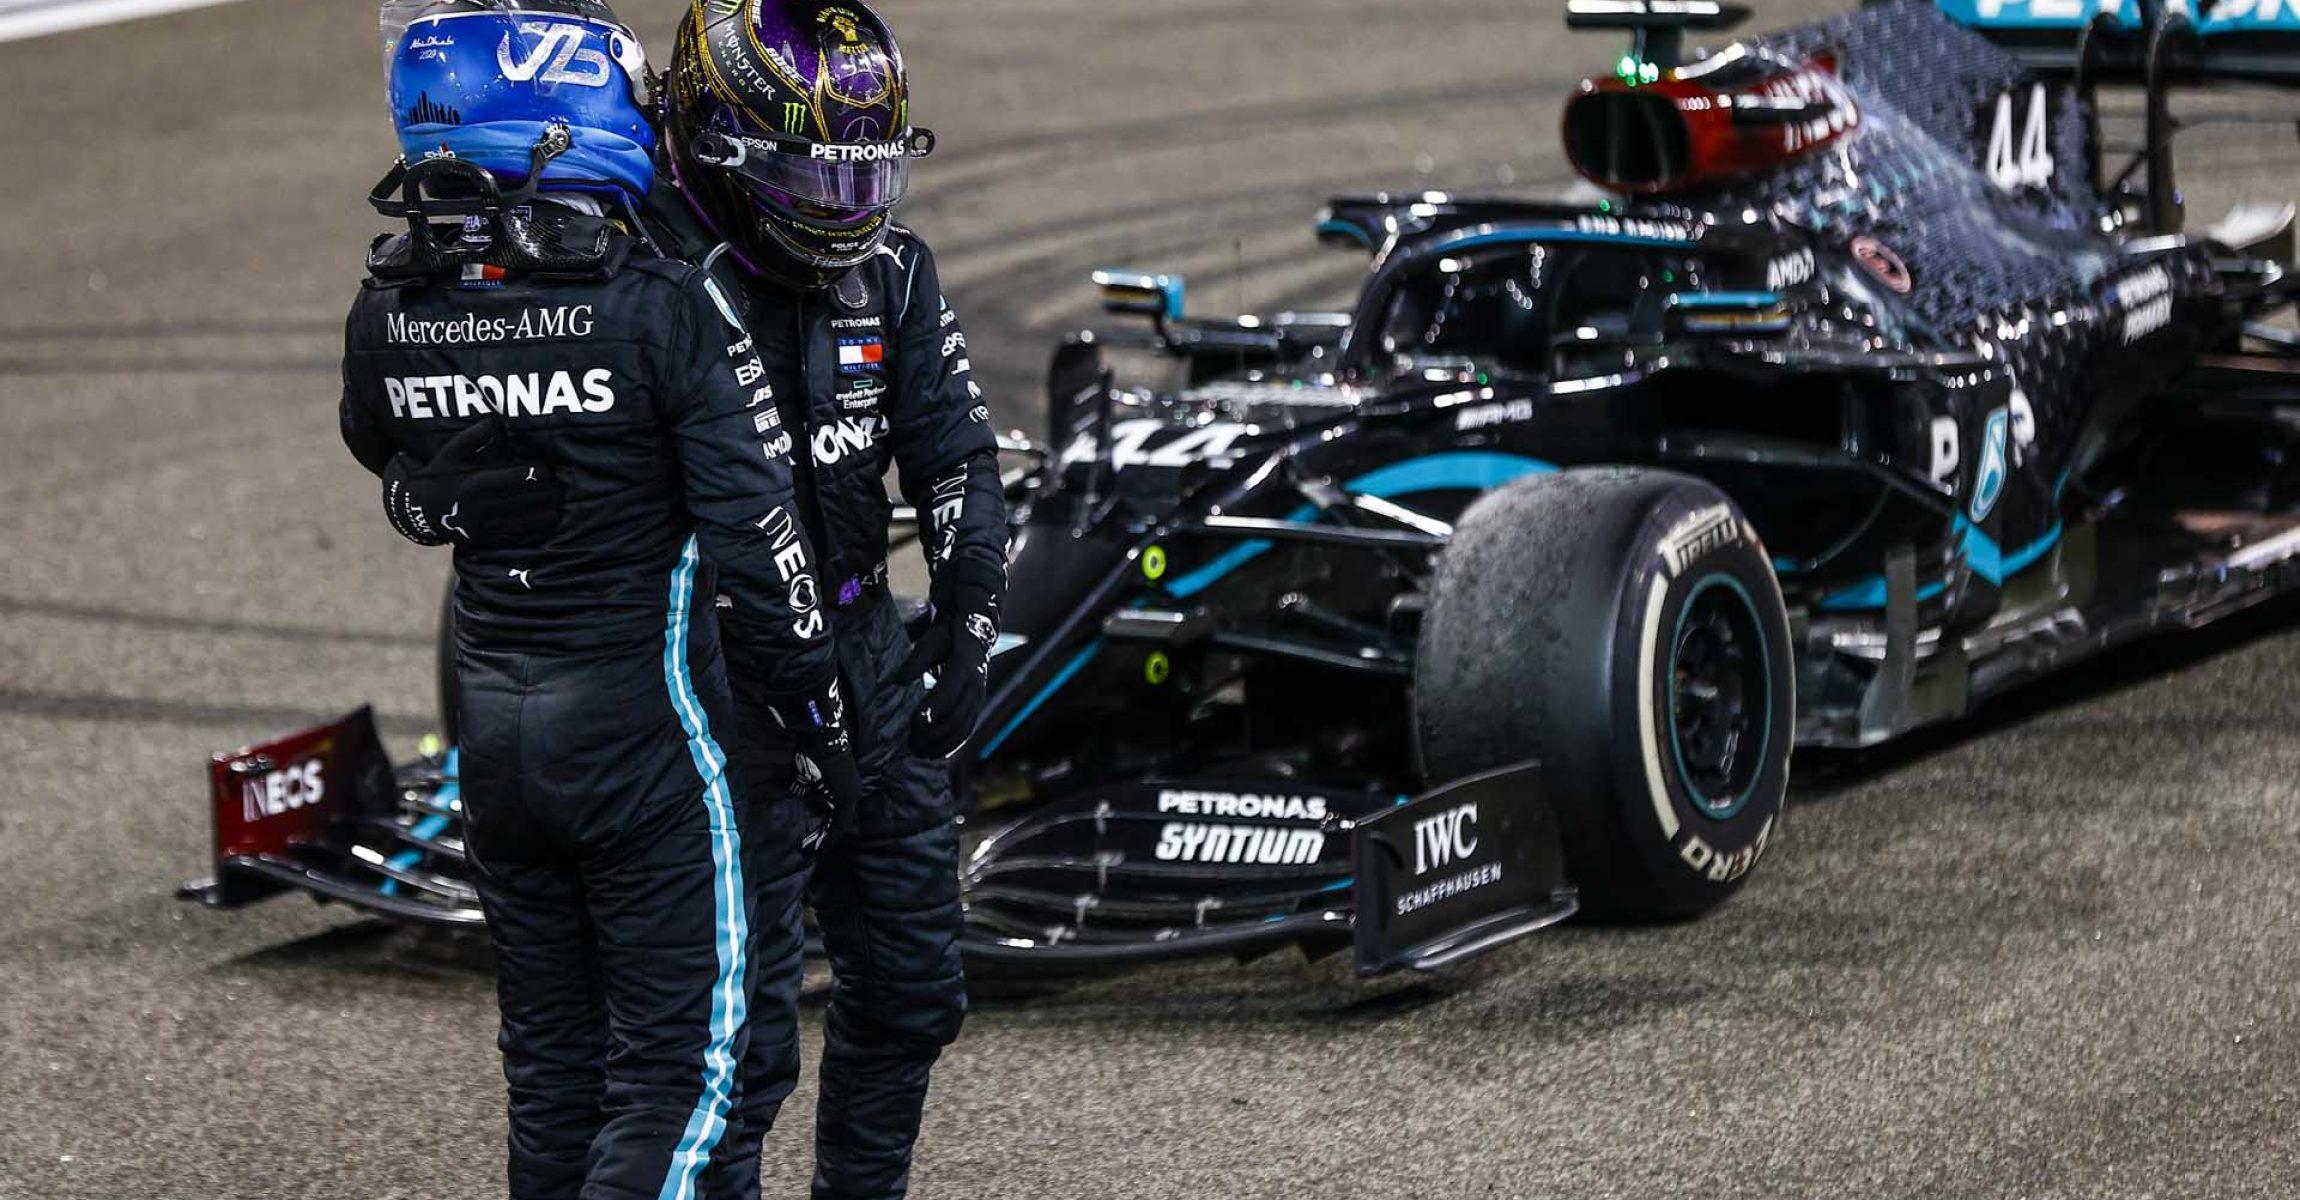 2020 Abu Dhabi Grand Prix, Sunday - LAT Images Valtteri Bottas Lewis Hamilton Mercedes